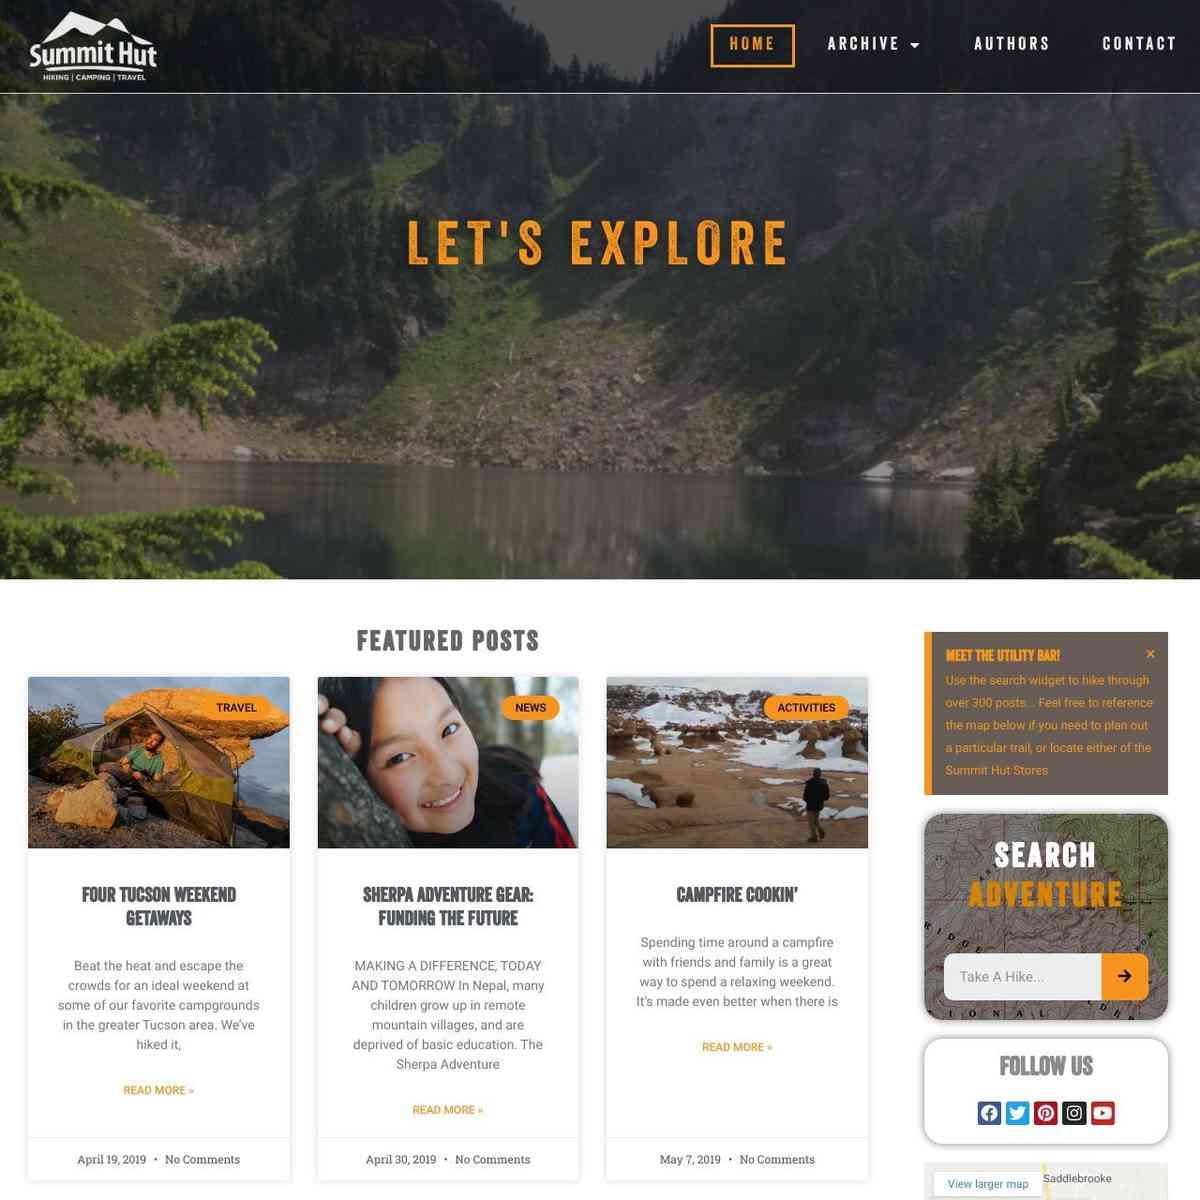 Summit Hut Blog